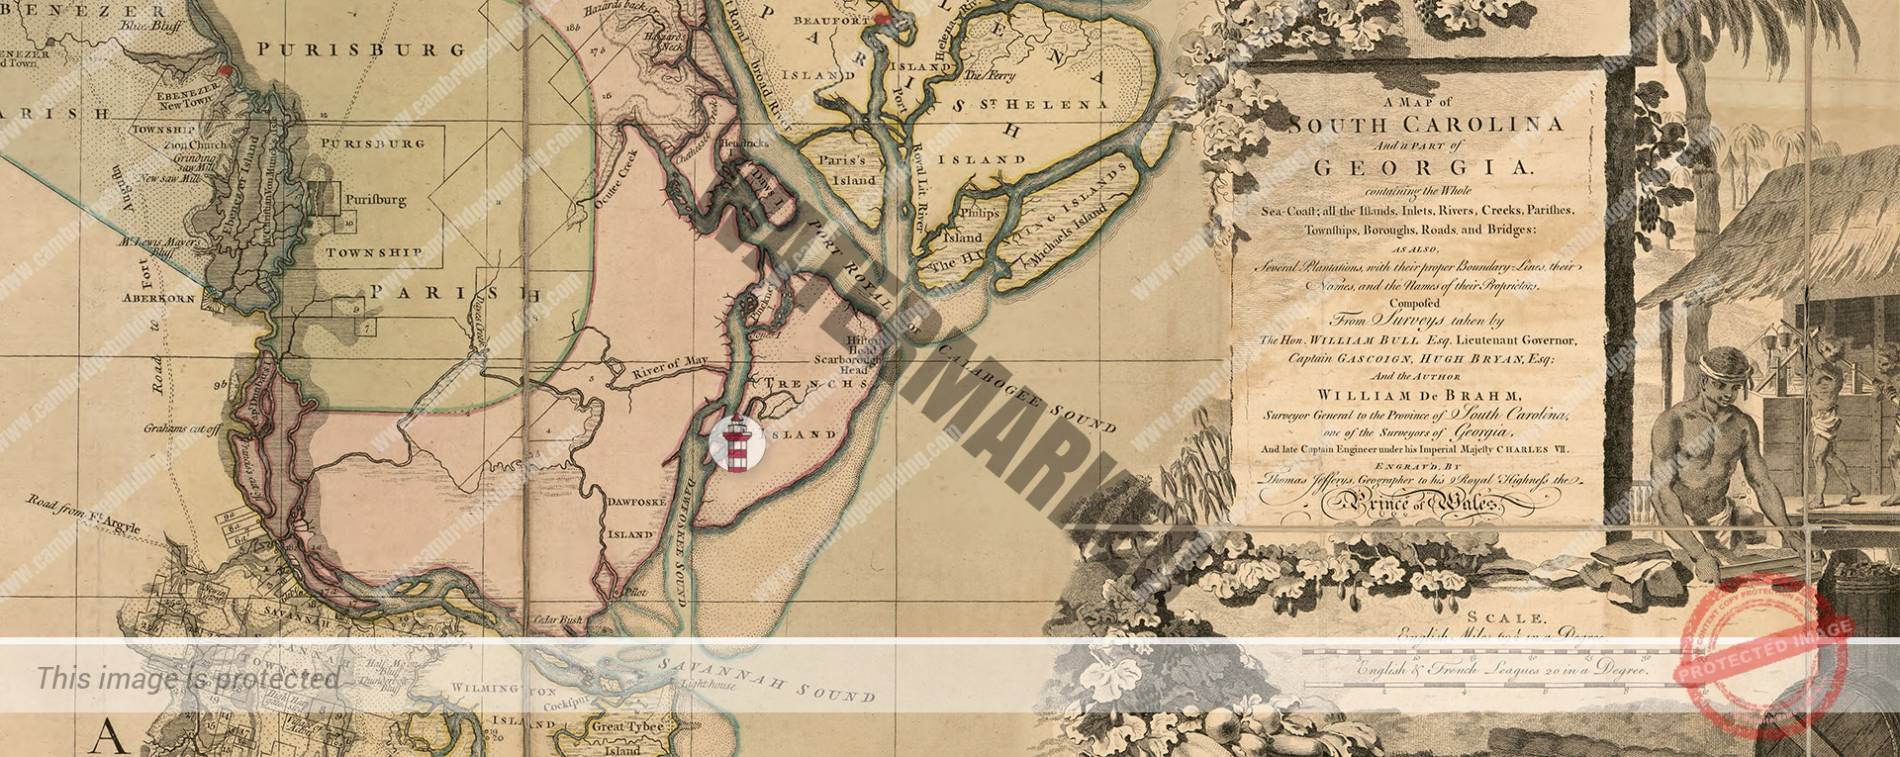 History of Hilton Head Island